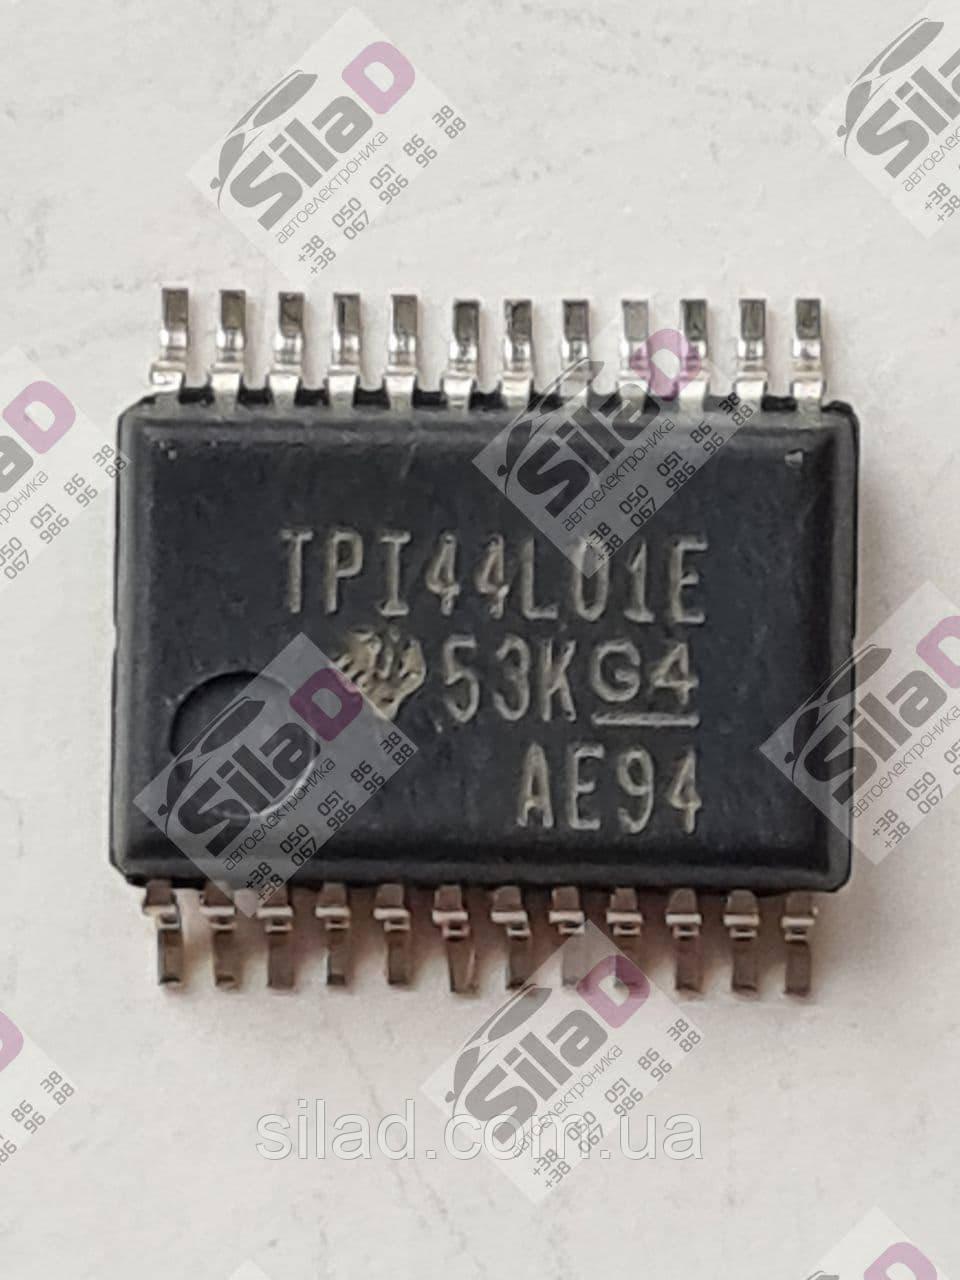 Микросхема TPI44L01E Texas Instruments корпус SSOP24